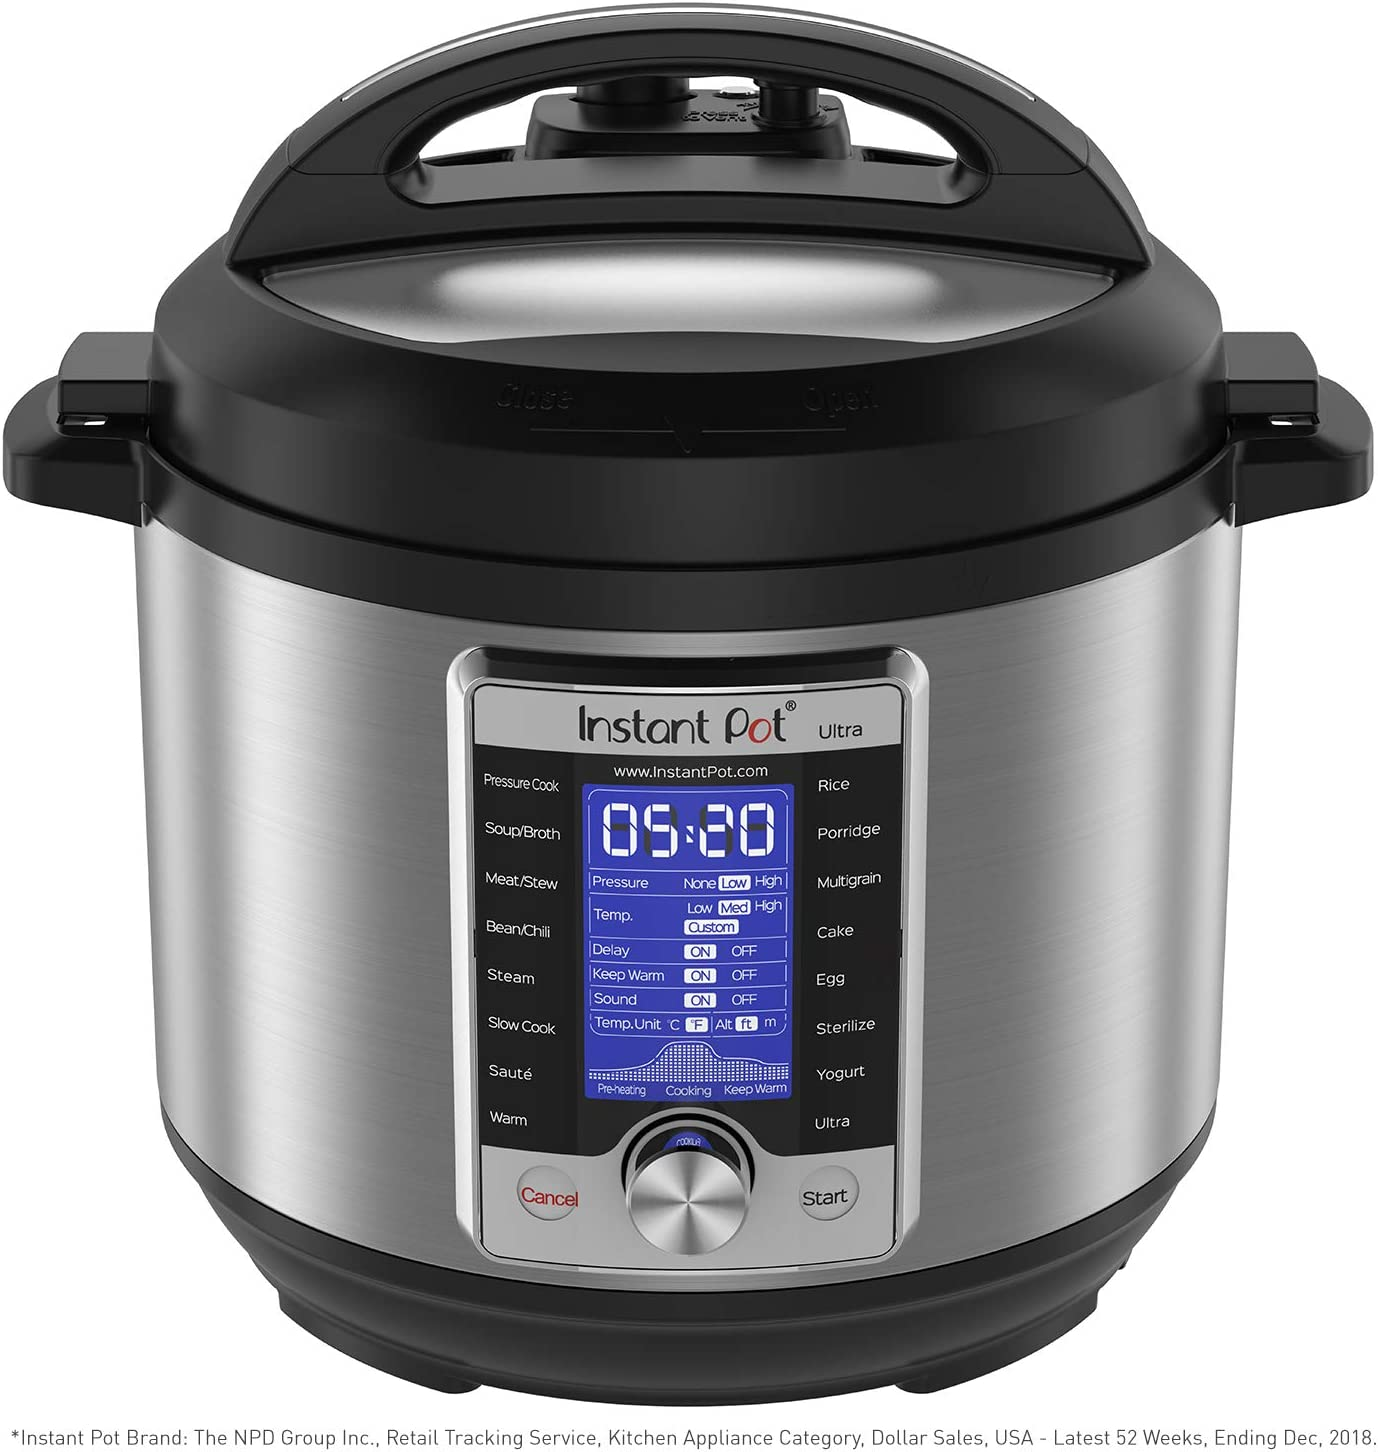 Instant Pot Ultra 10-in-1 Electric Pressure Cooker, Slow Cooker, Rice Cooker, Steamer, Saute, Yogurt Maker, Cake Maker, Egg Cooker, Sterilizer, and Warmer|6 Quart|16 One-Touch Programs